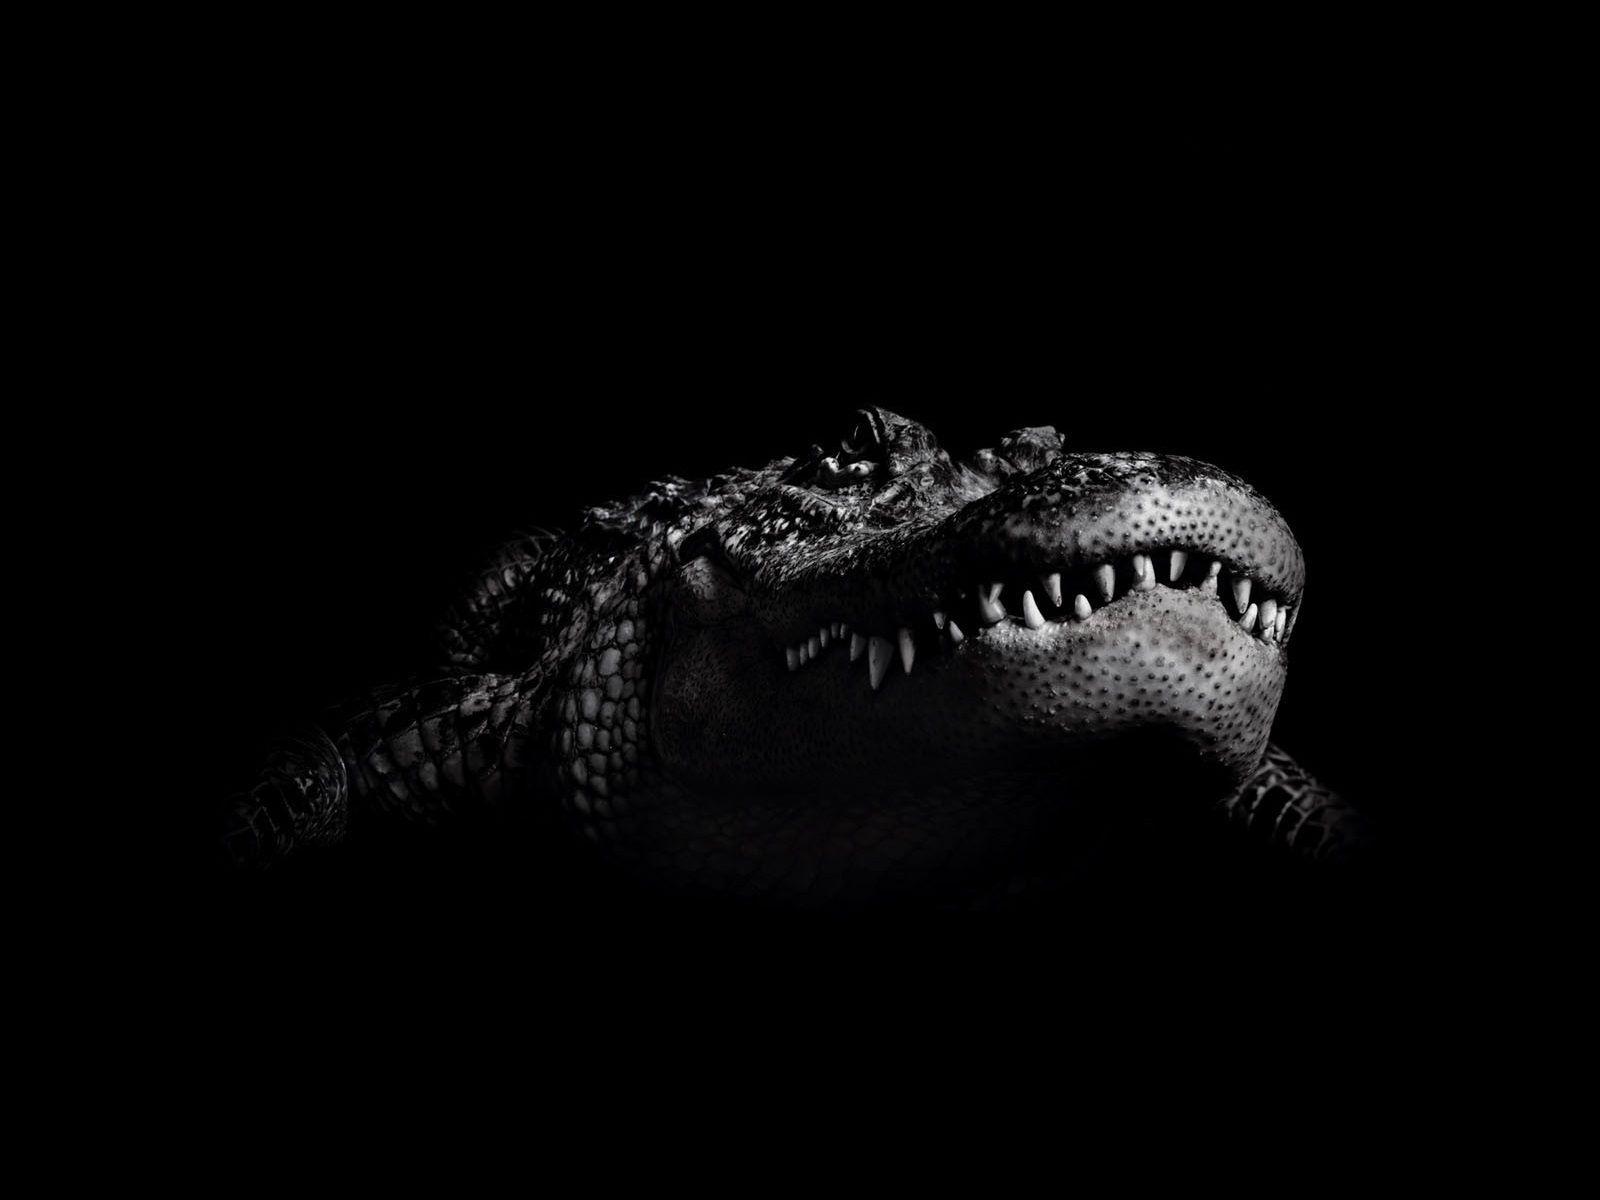 Crocodile Hd Background destiné Mots Gator